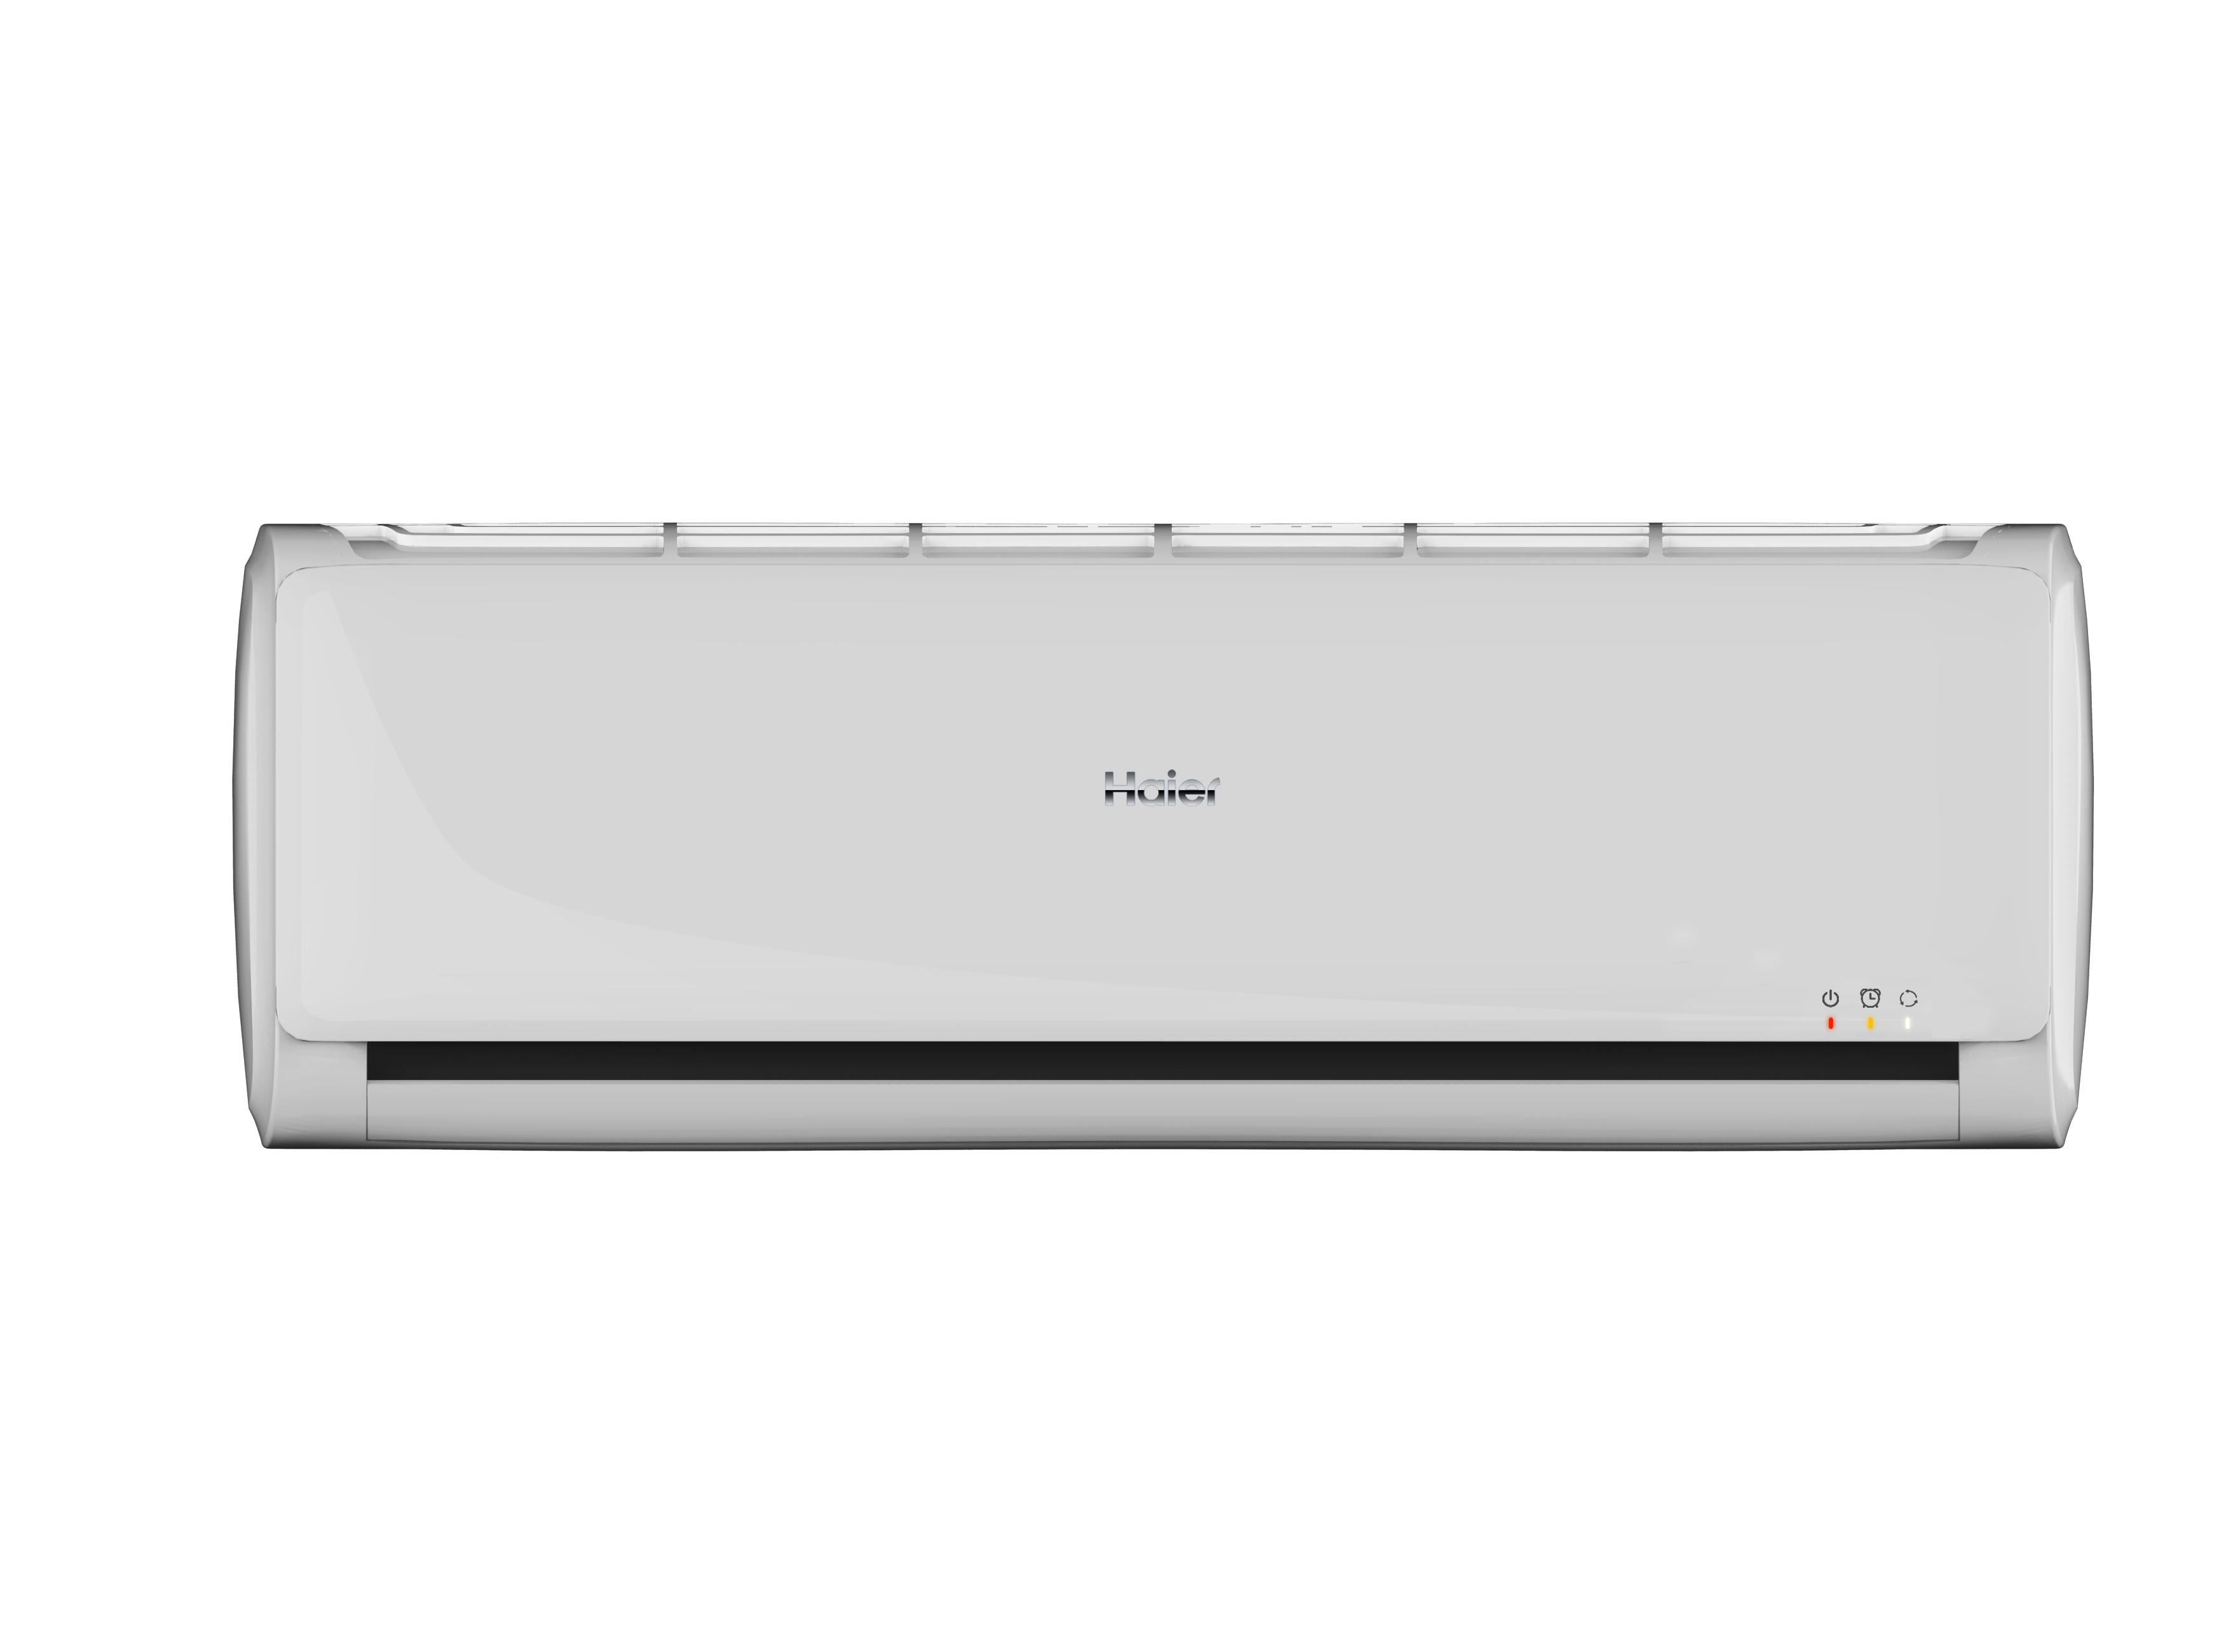 Aer conditionat Aer Conditionat Haier 9000 btu Clasa A++ cu tehnologie Inverter